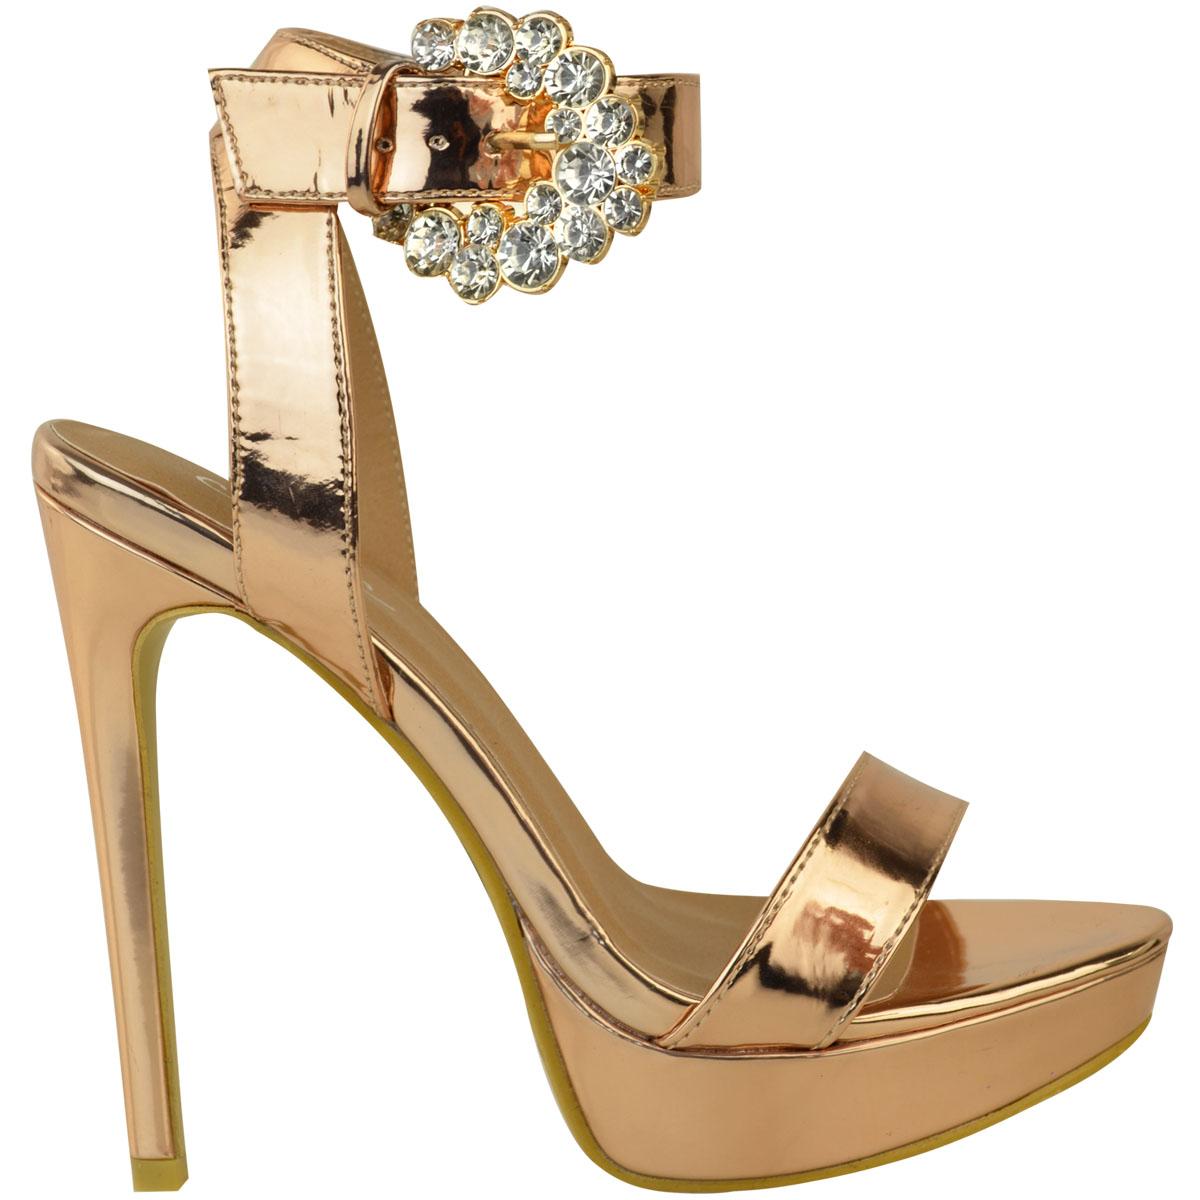 Womens-Ladies-Stilettos-High-Heels-Strappy-Platforms-Sandals-Diamante-Shoes-Size thumbnail 35